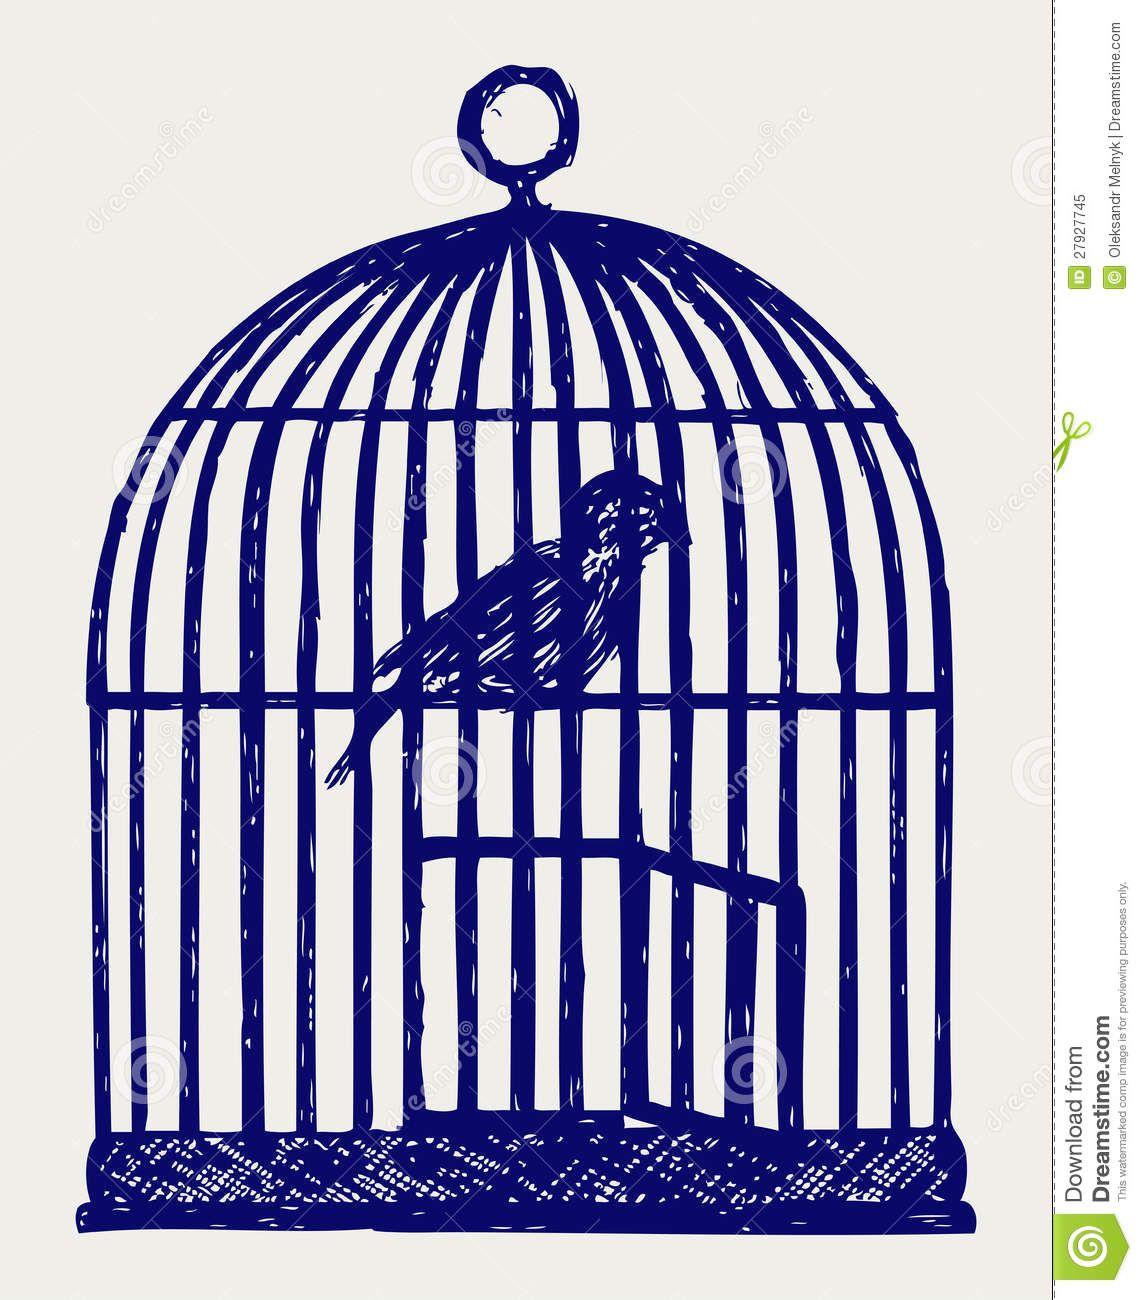 1142x1300 Pics For Gt Open Bird Cage Clip Art Yellow Birdcage